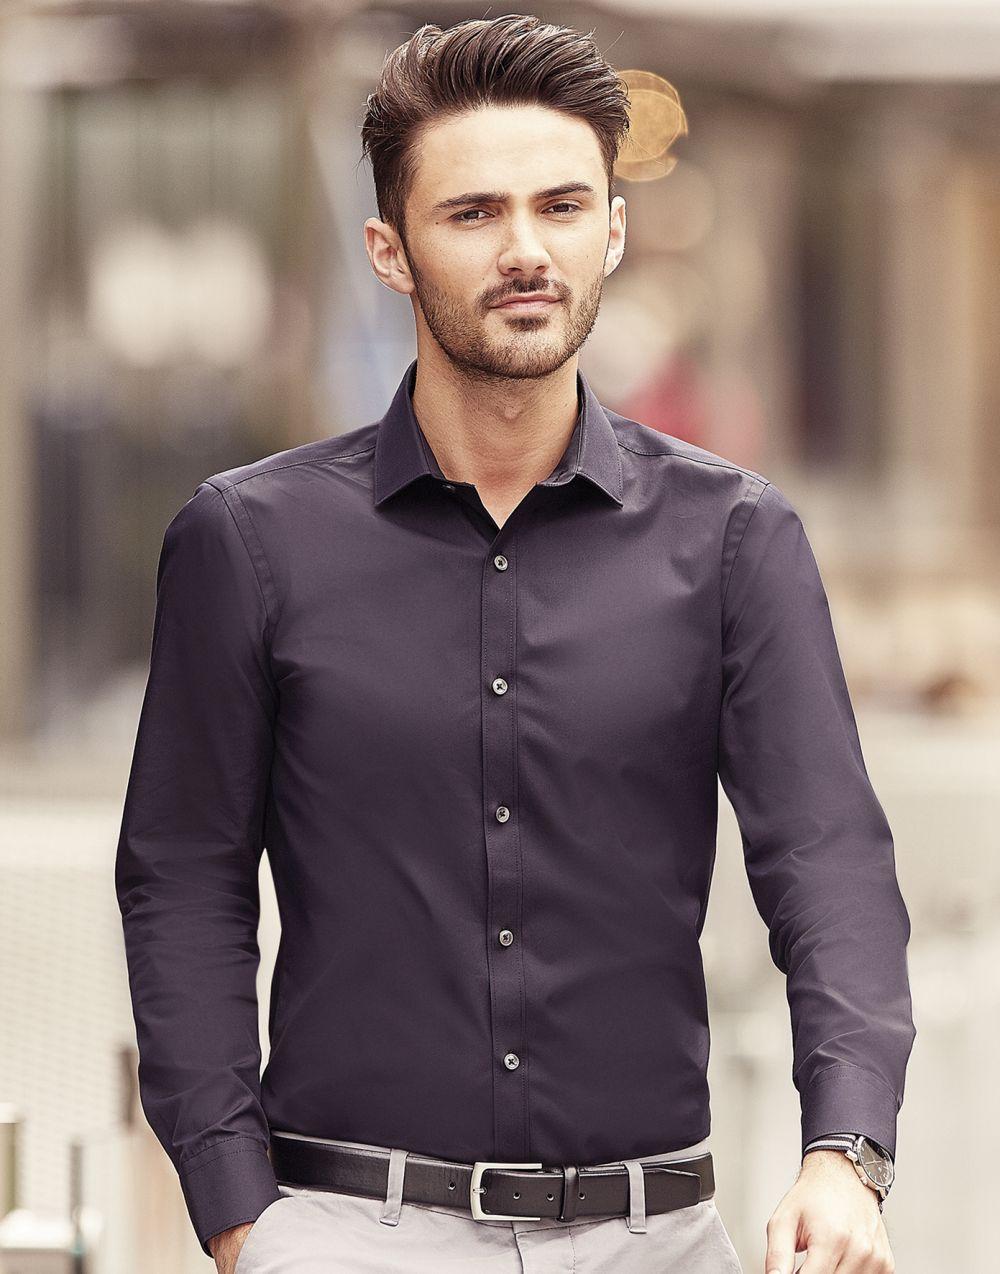 Camisas manga larga russell ajustada manga larga ultimate hombre con publicidad vista 5